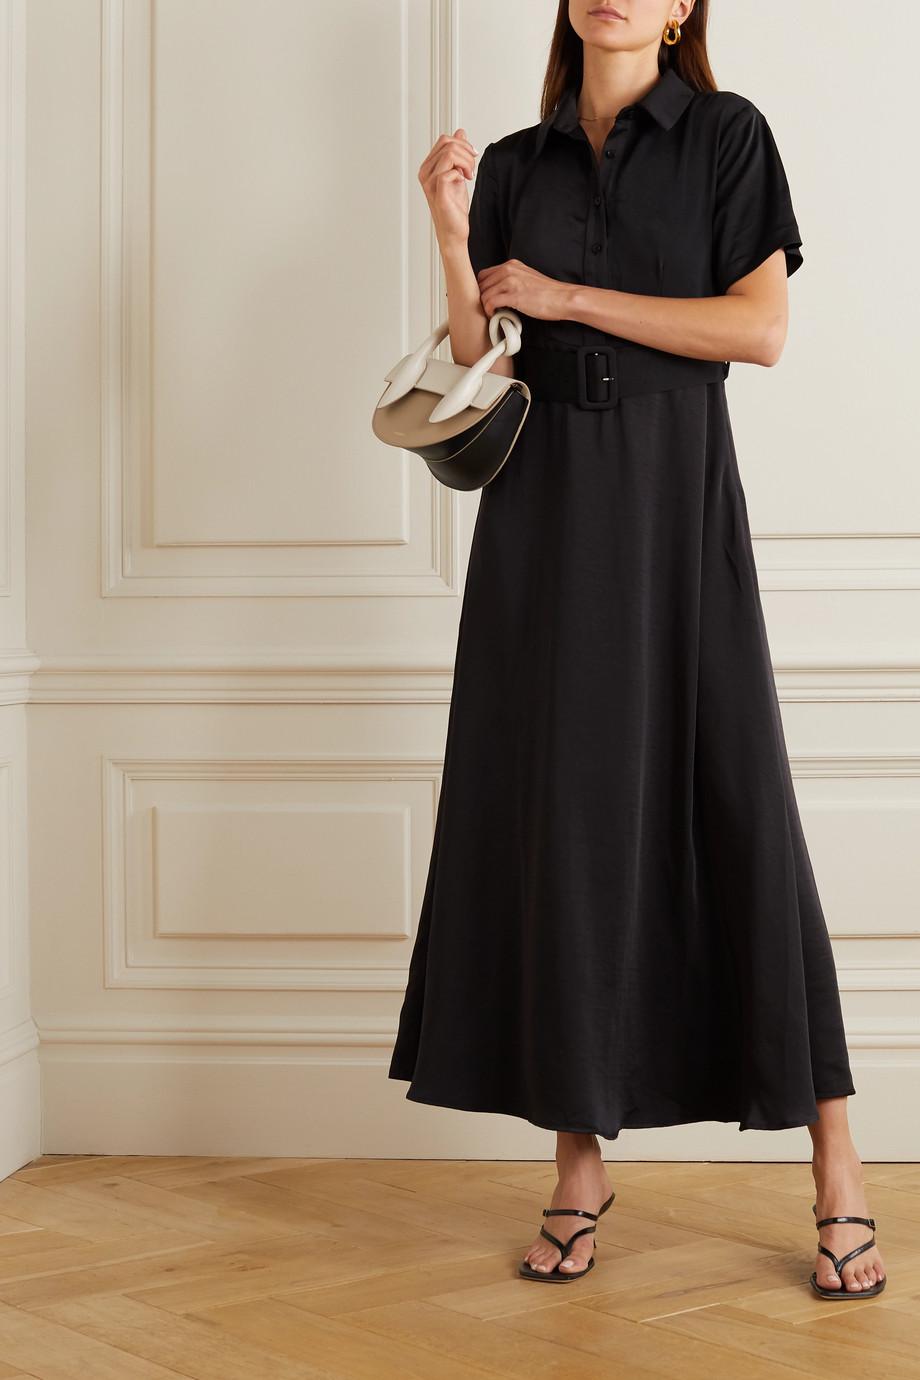 MUNTHE 配腰带水洗缎布中长衬衫式连衣裙